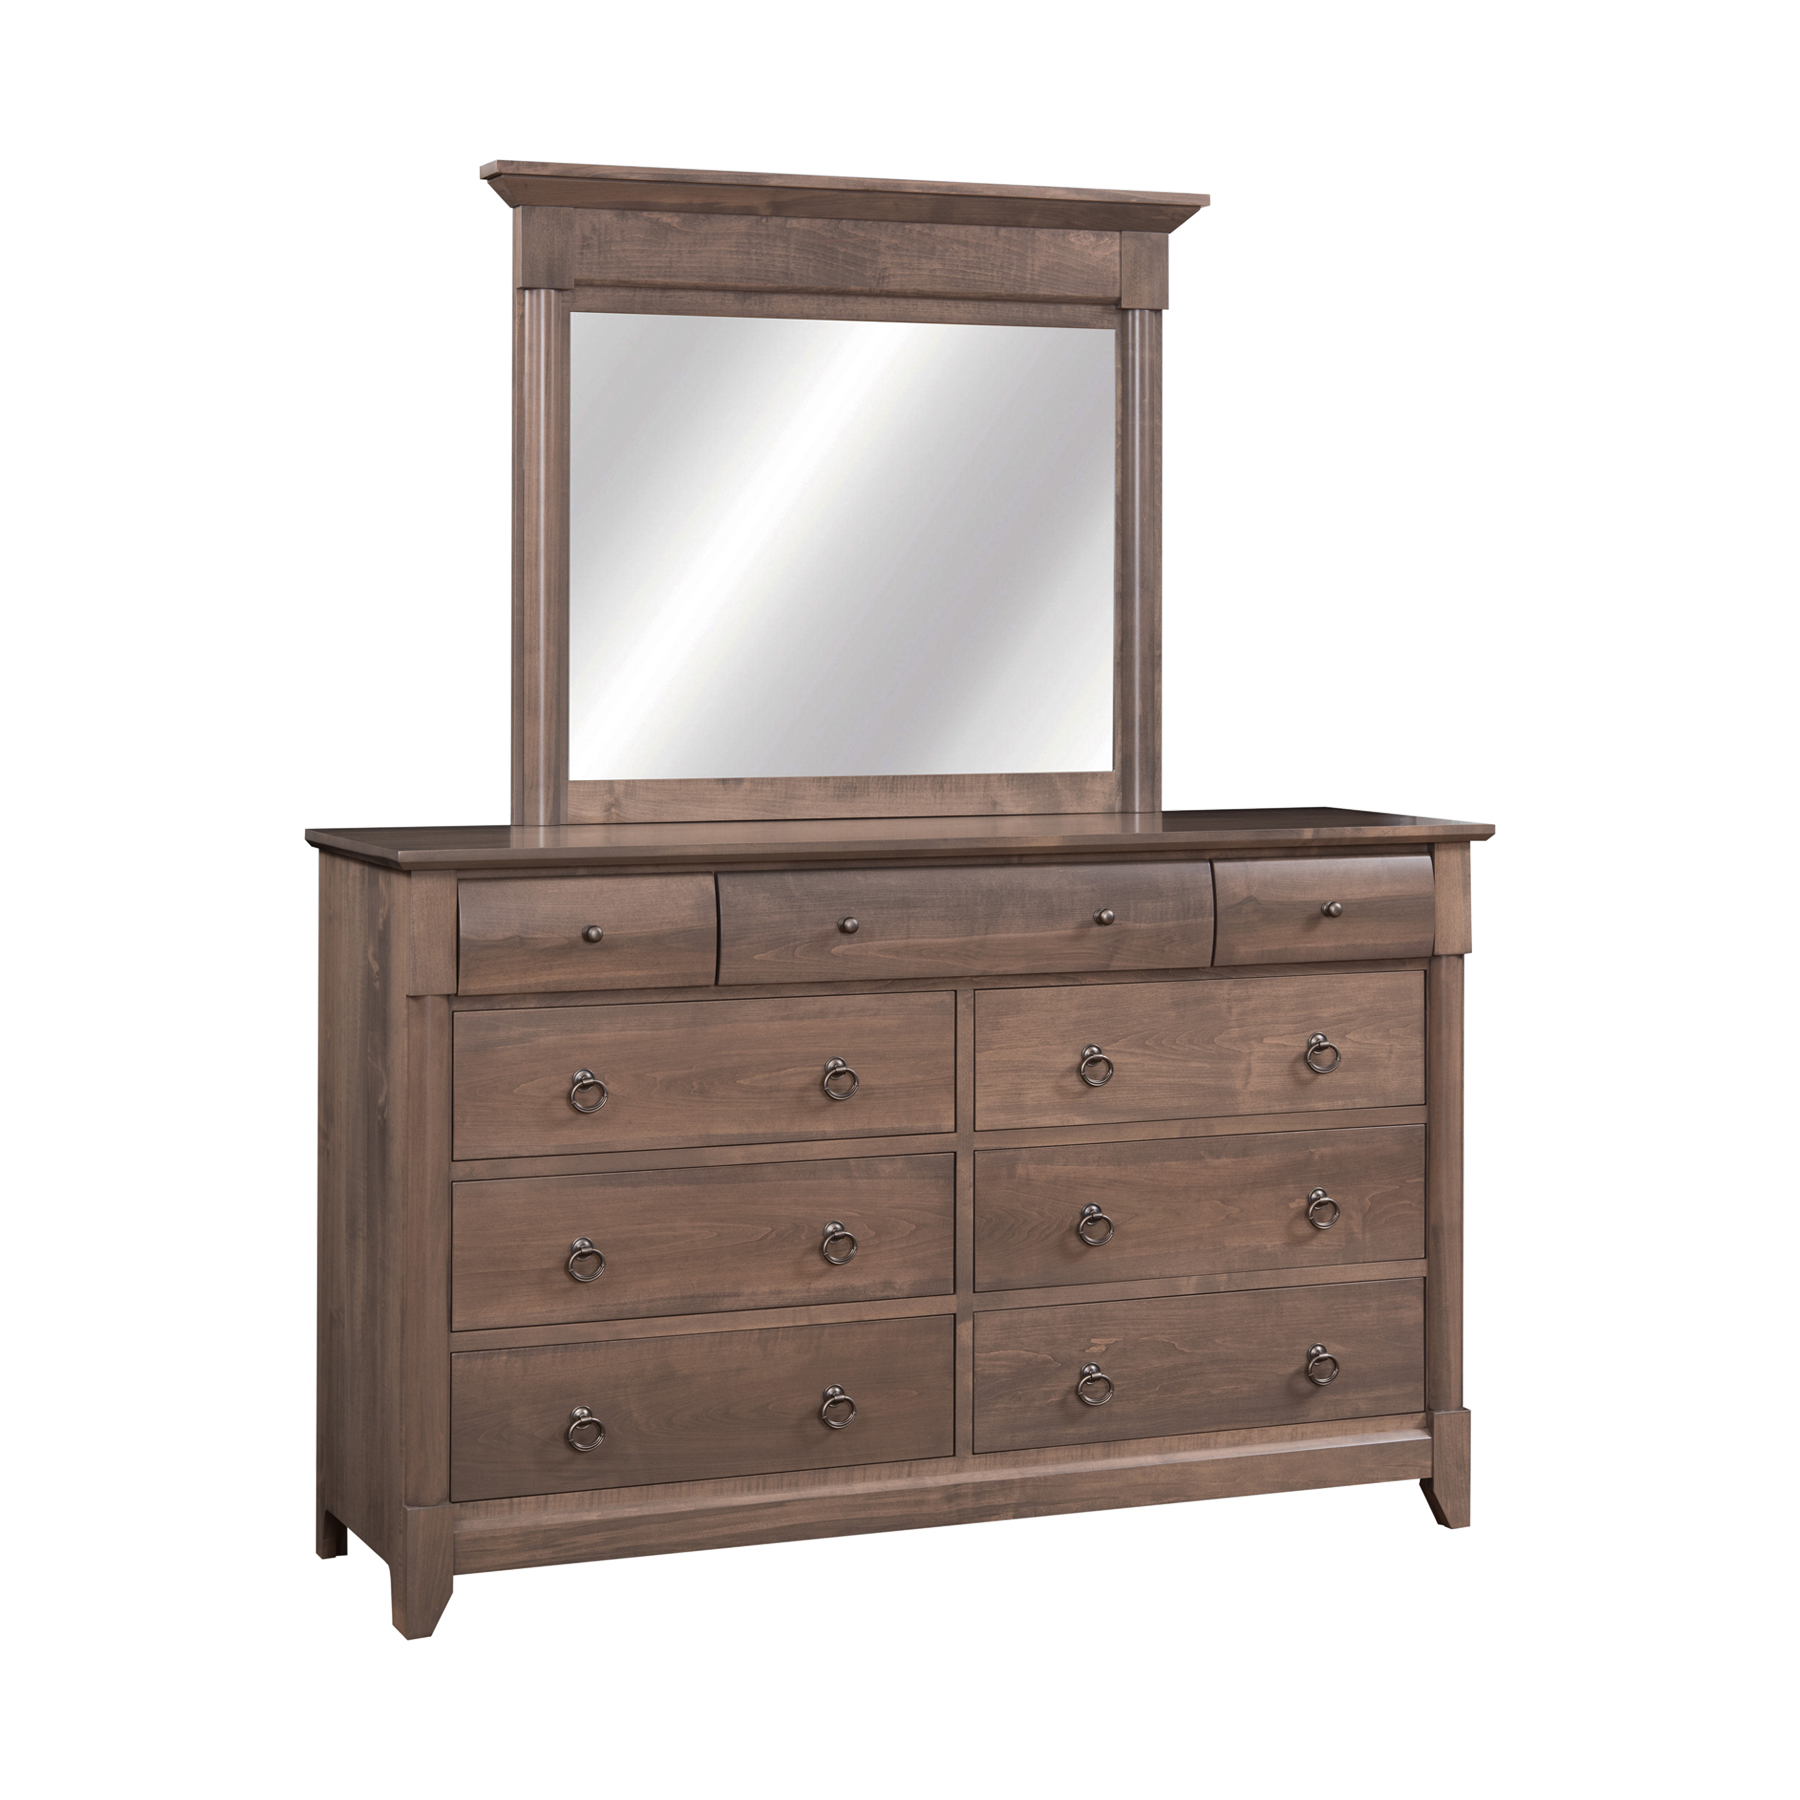 Mule Dresser with Mirror